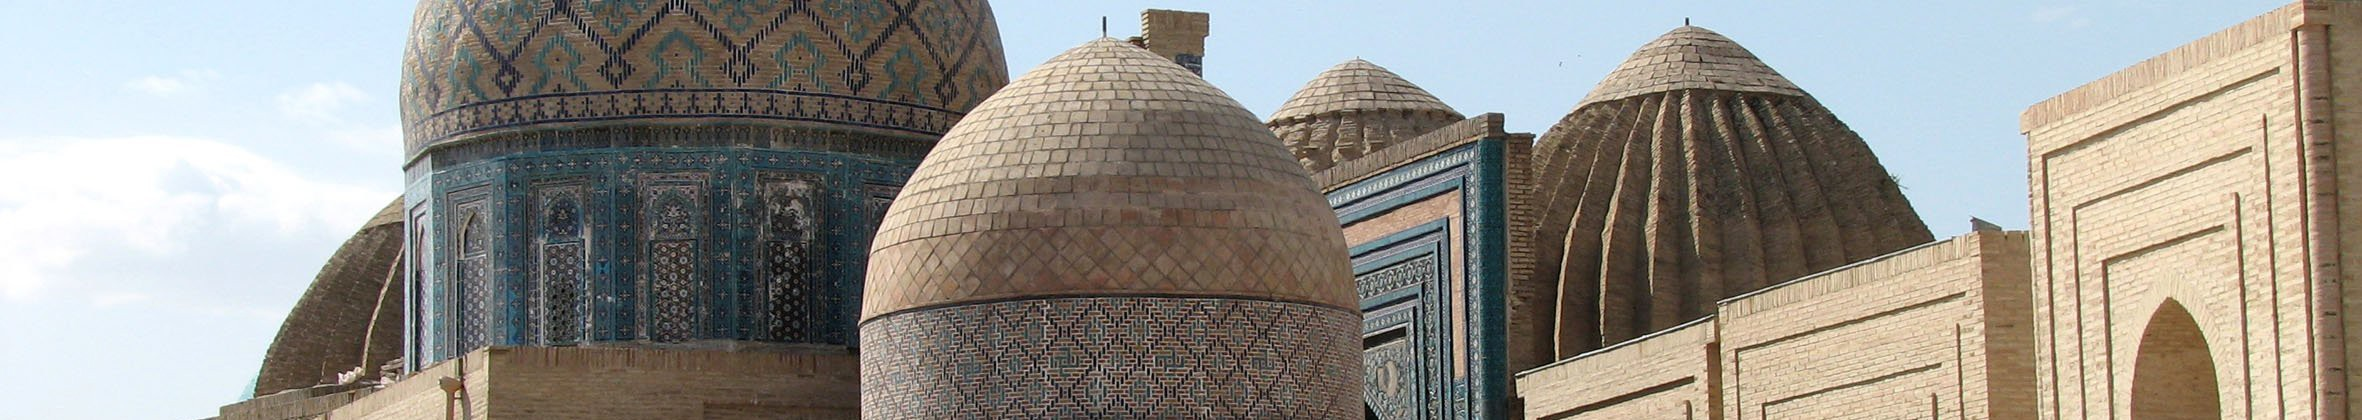 Samarkand and Bukhara Tour - 1